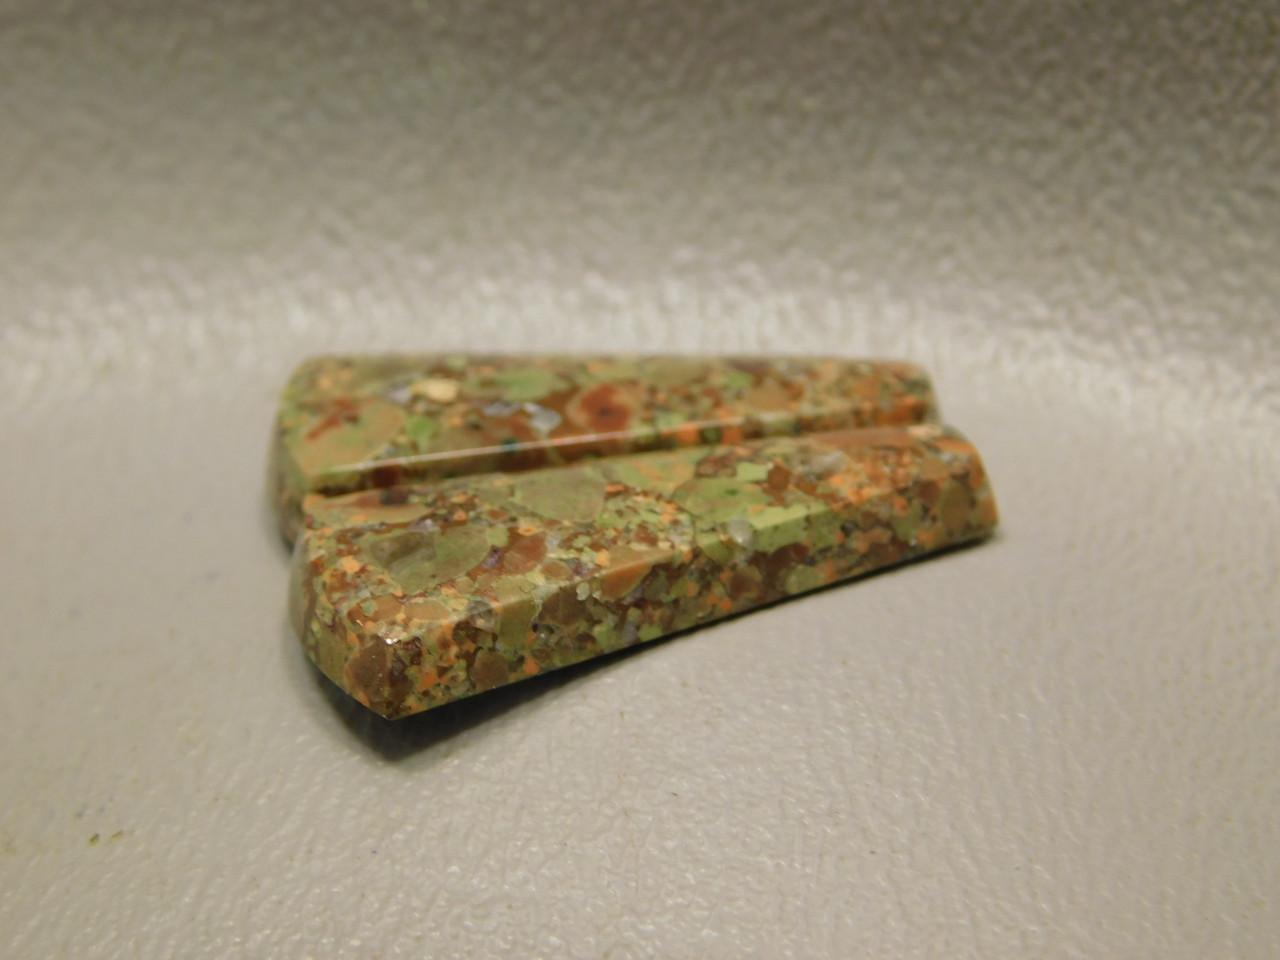 Copper Rose Semi Precious Gemstone Matched Pair Cabochons #15